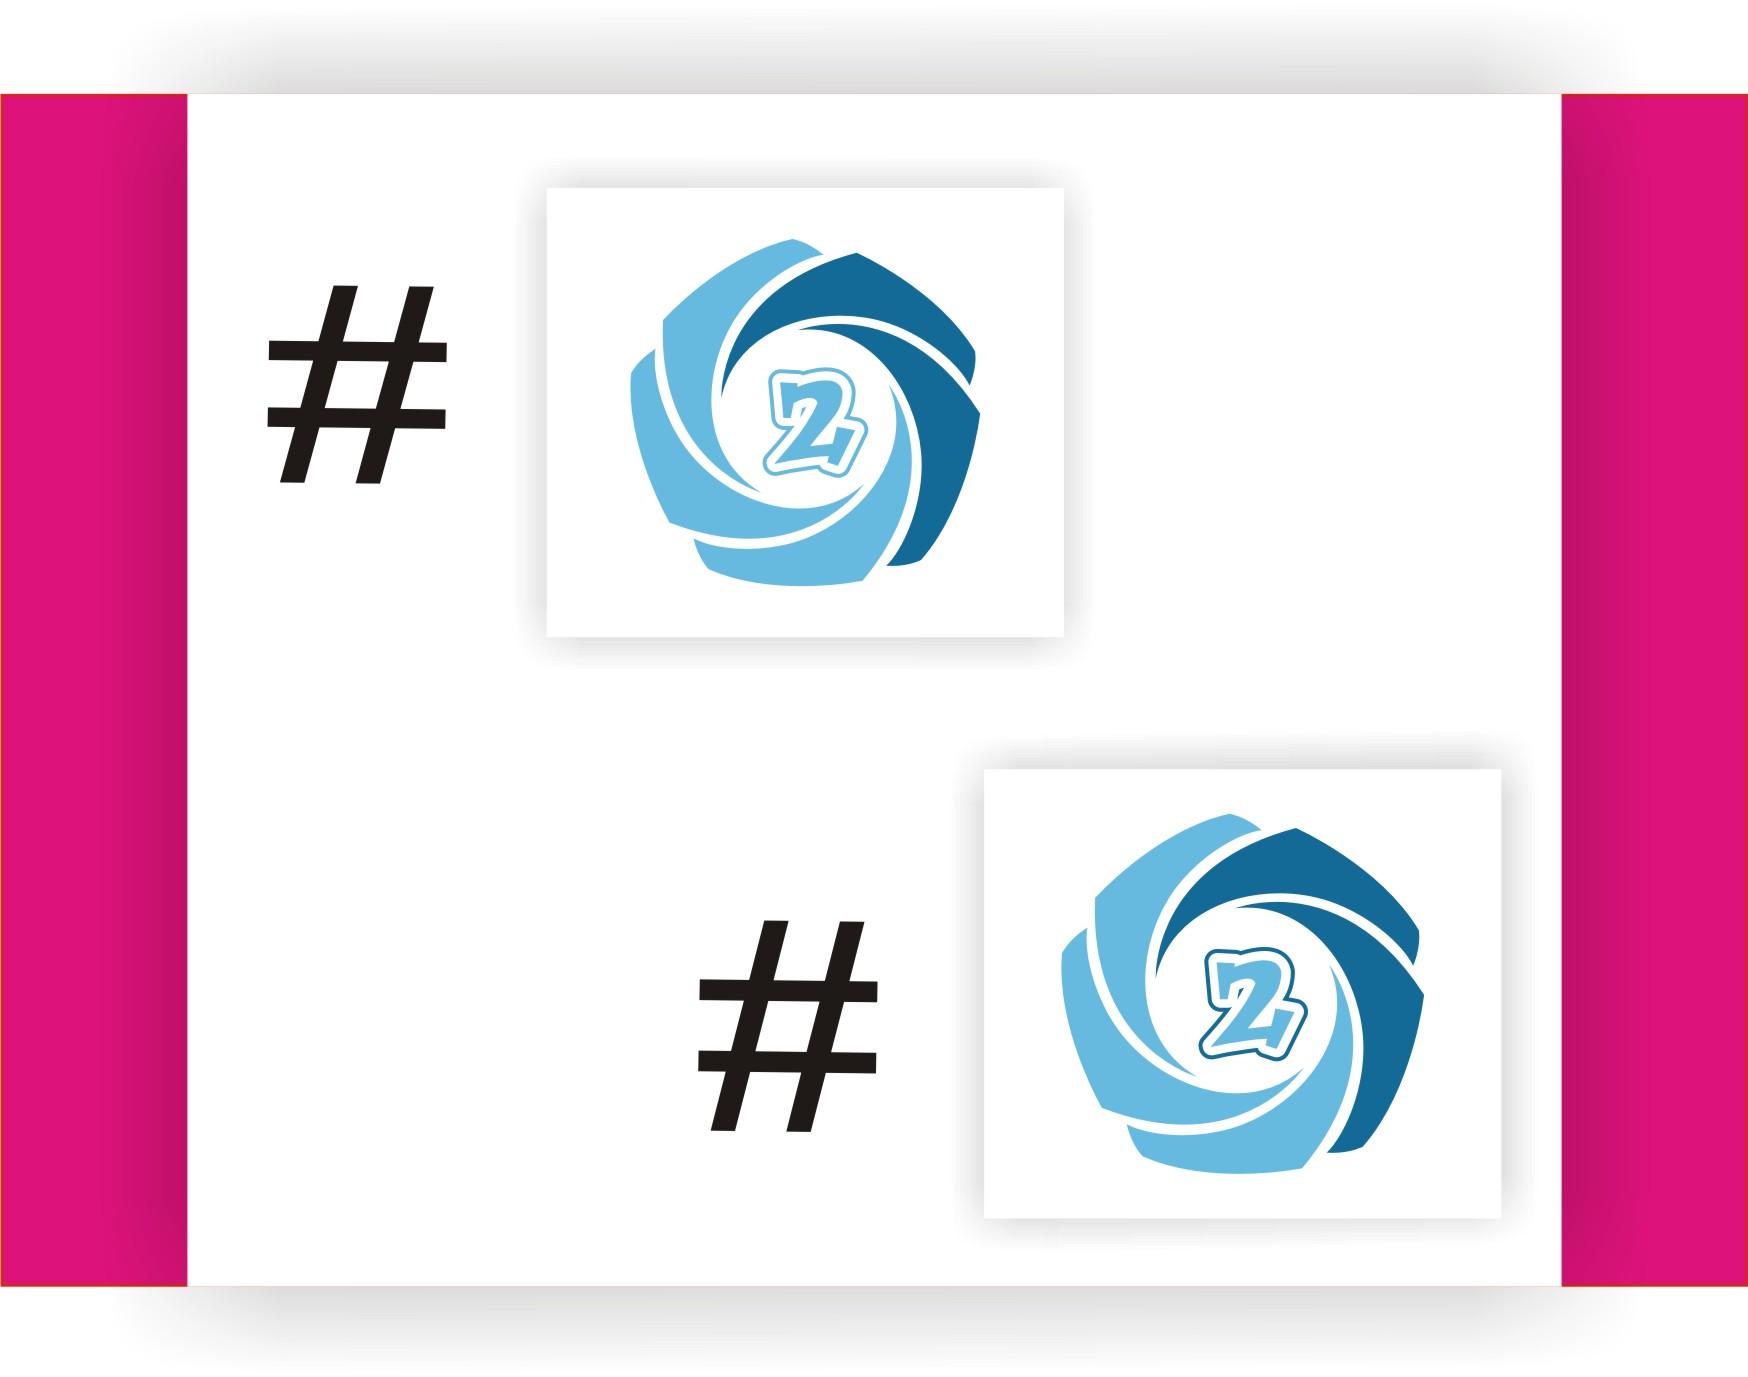 Logo Design by Shailender Kumar - Entry No. 167 in the Logo Design Contest Artistic Logo Design for O2.